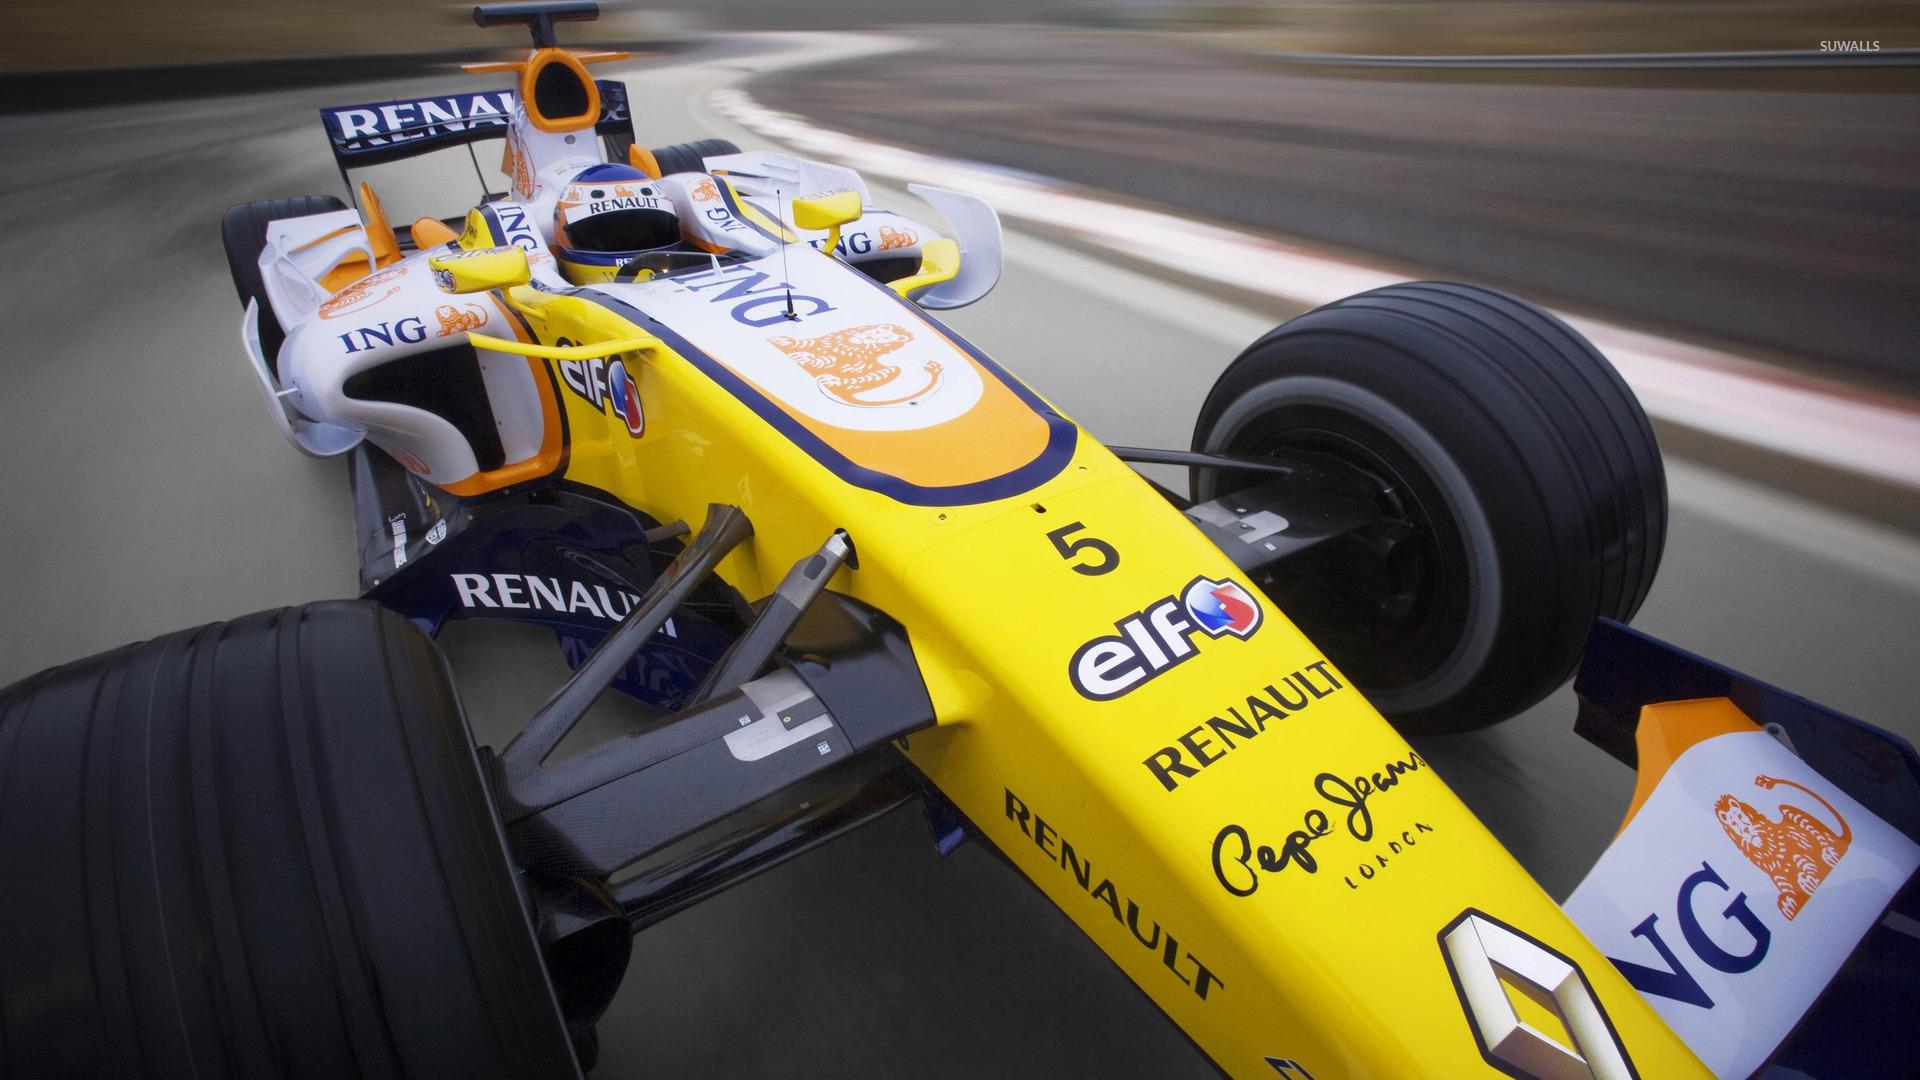 renault formula 1 wallpaper - photo #40